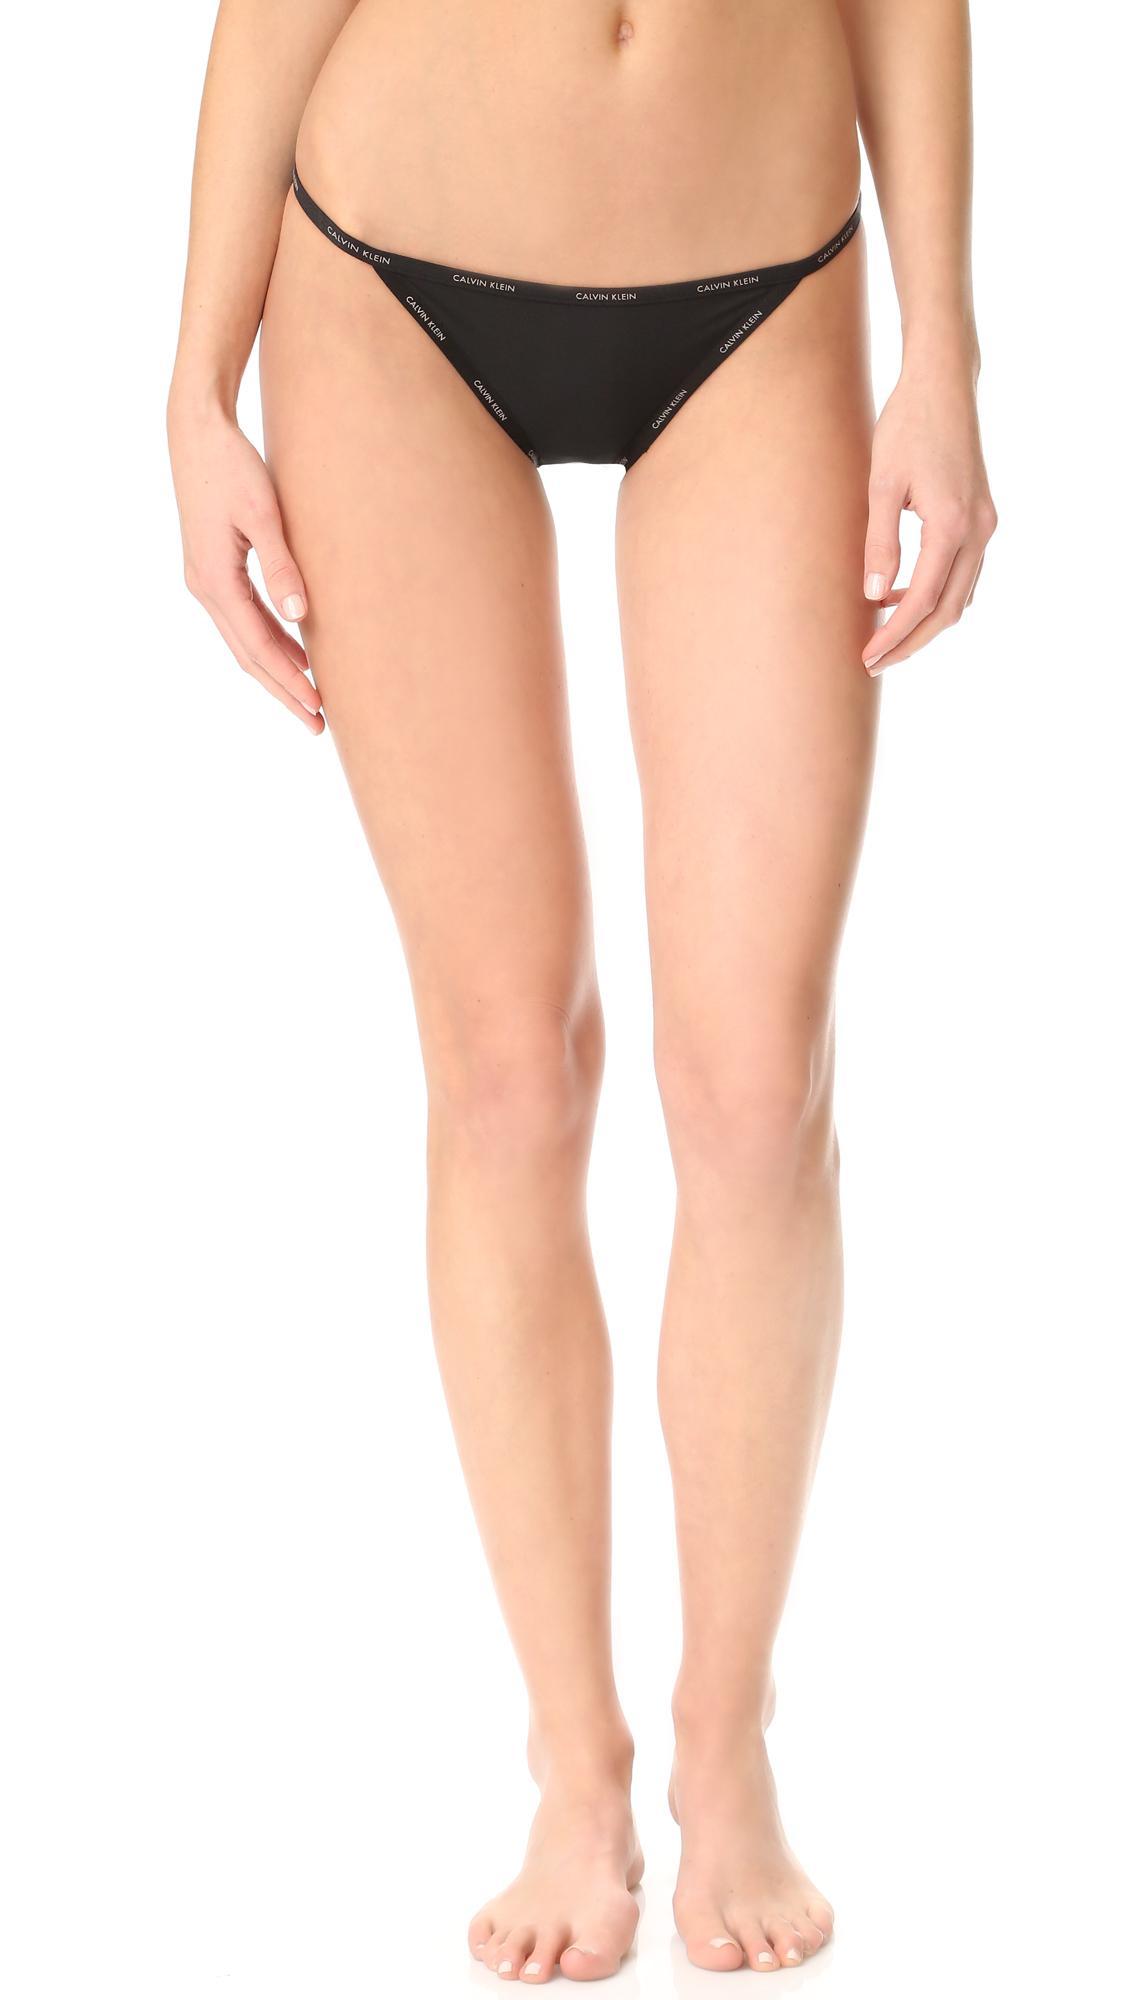 lyst calvin klein sheer marq string bikini in black. Black Bedroom Furniture Sets. Home Design Ideas